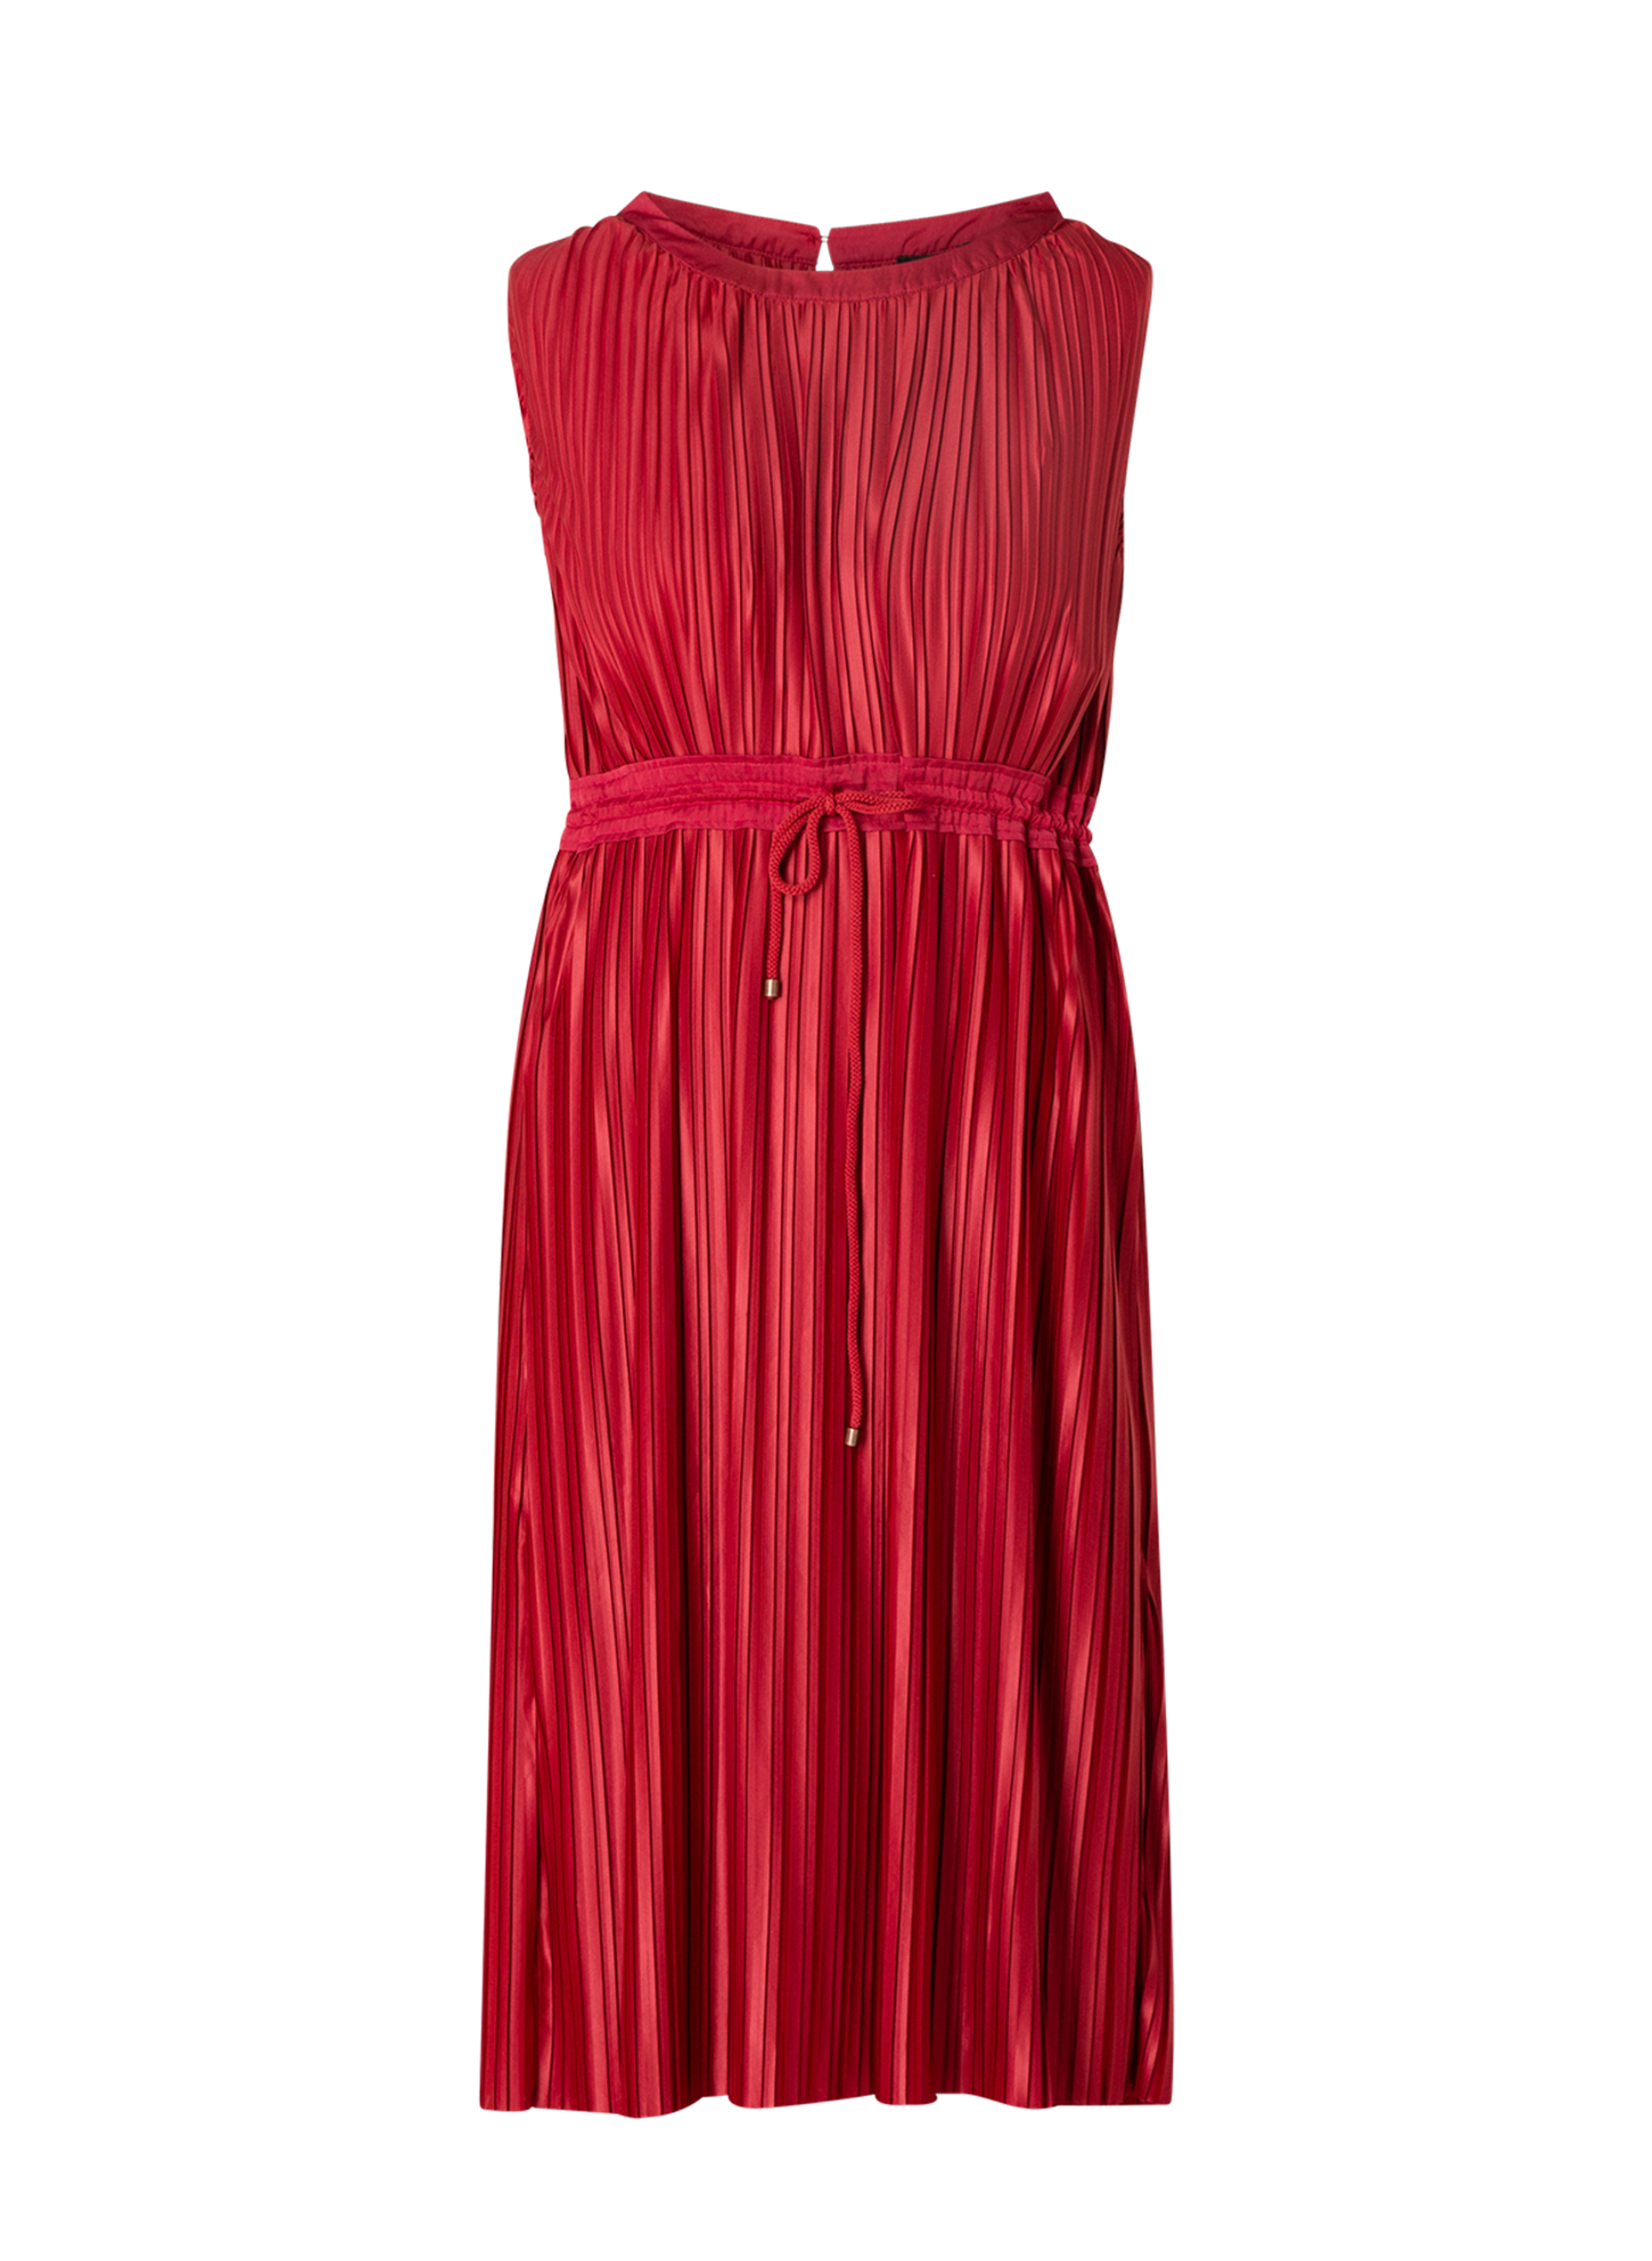 Yesta jurk Jasley 118 cm